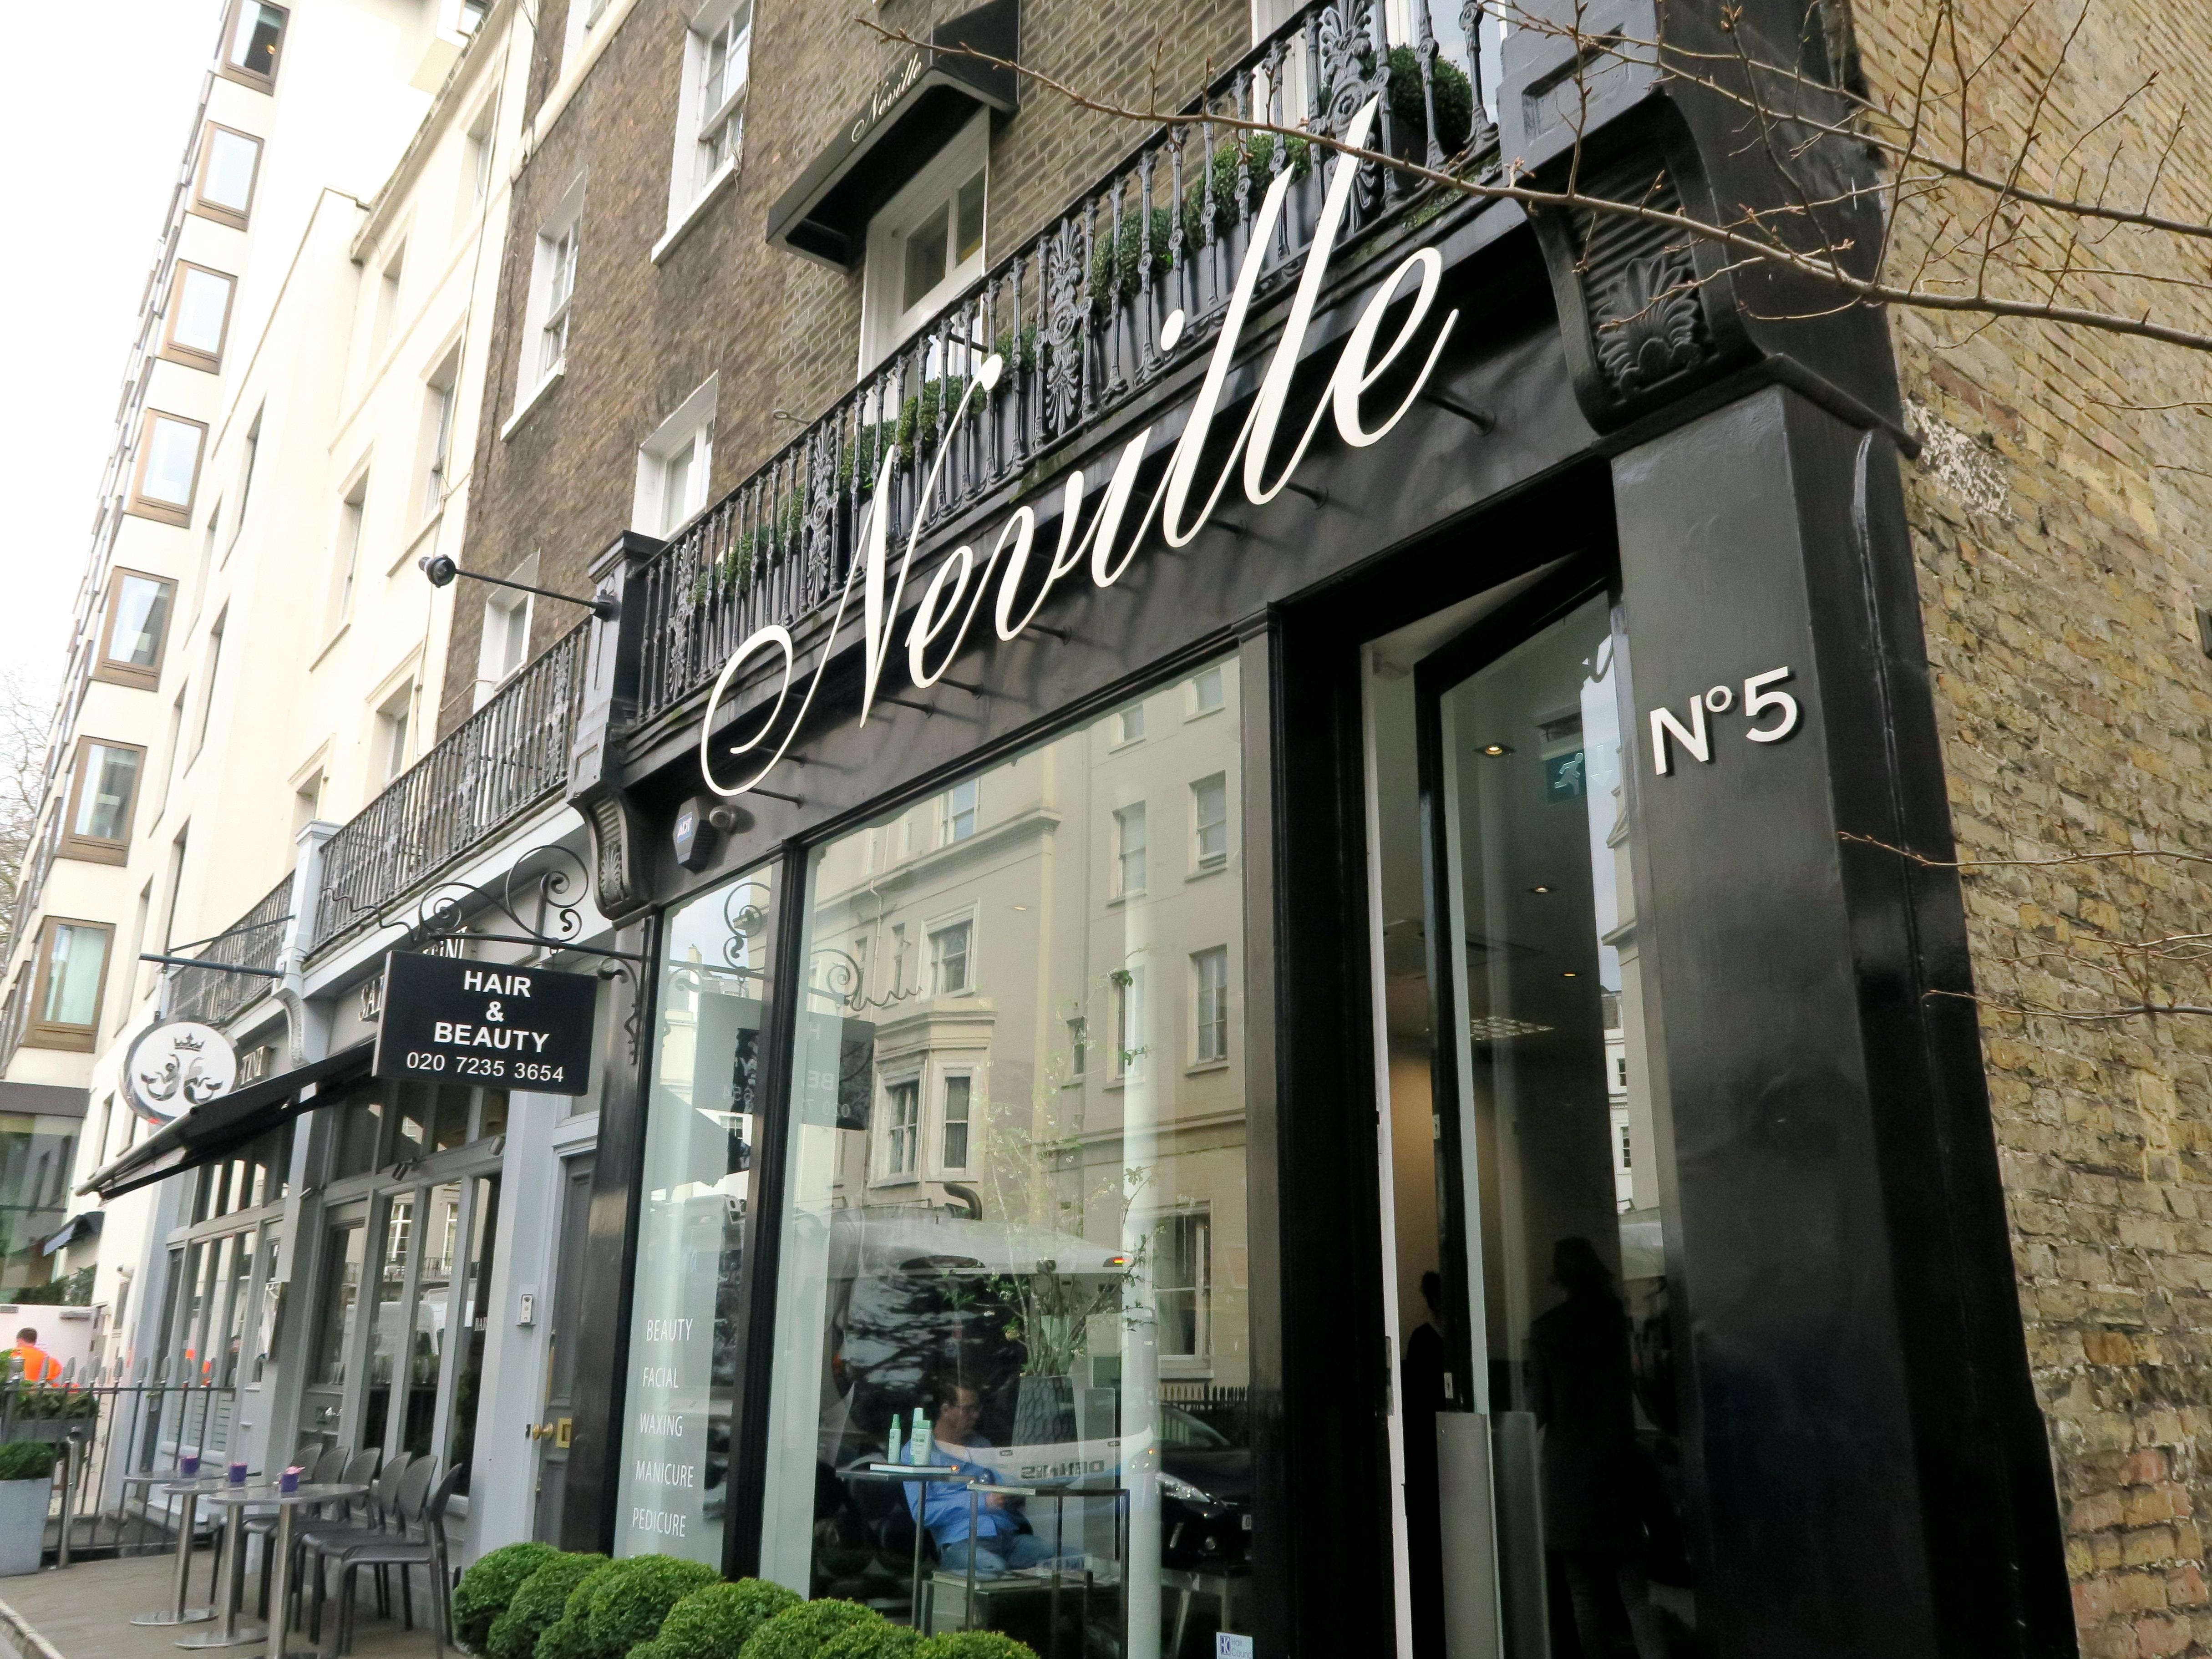 Neville Hairdresser Review